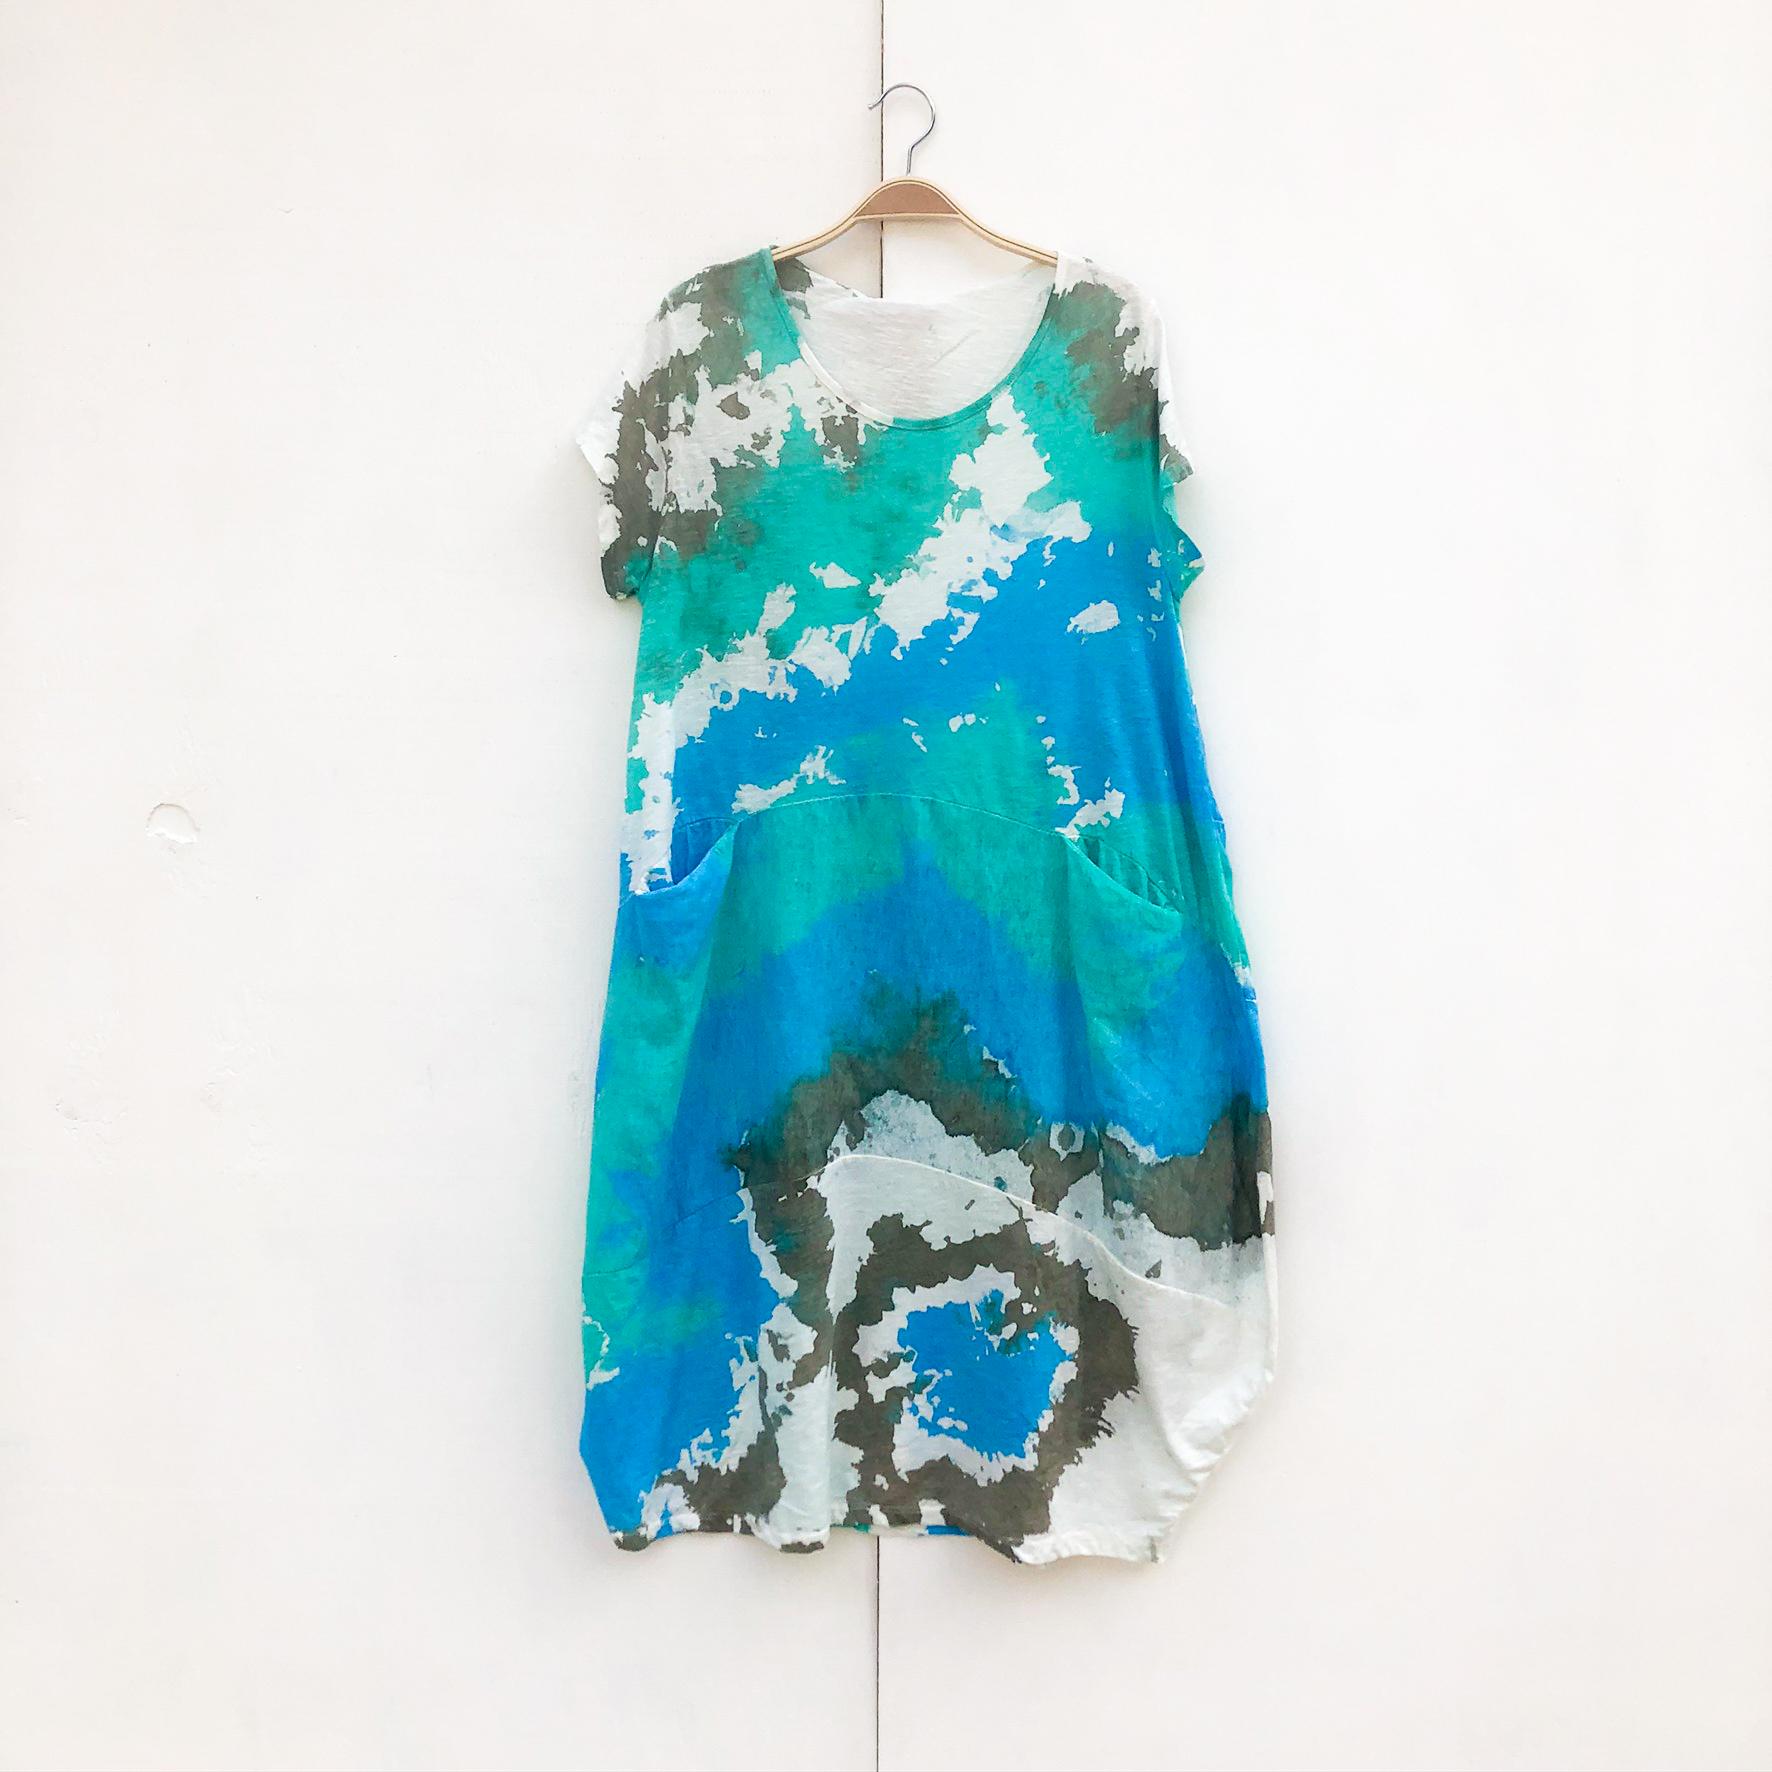 Short Two Pocket Dress on Hanger - Aqua Splash